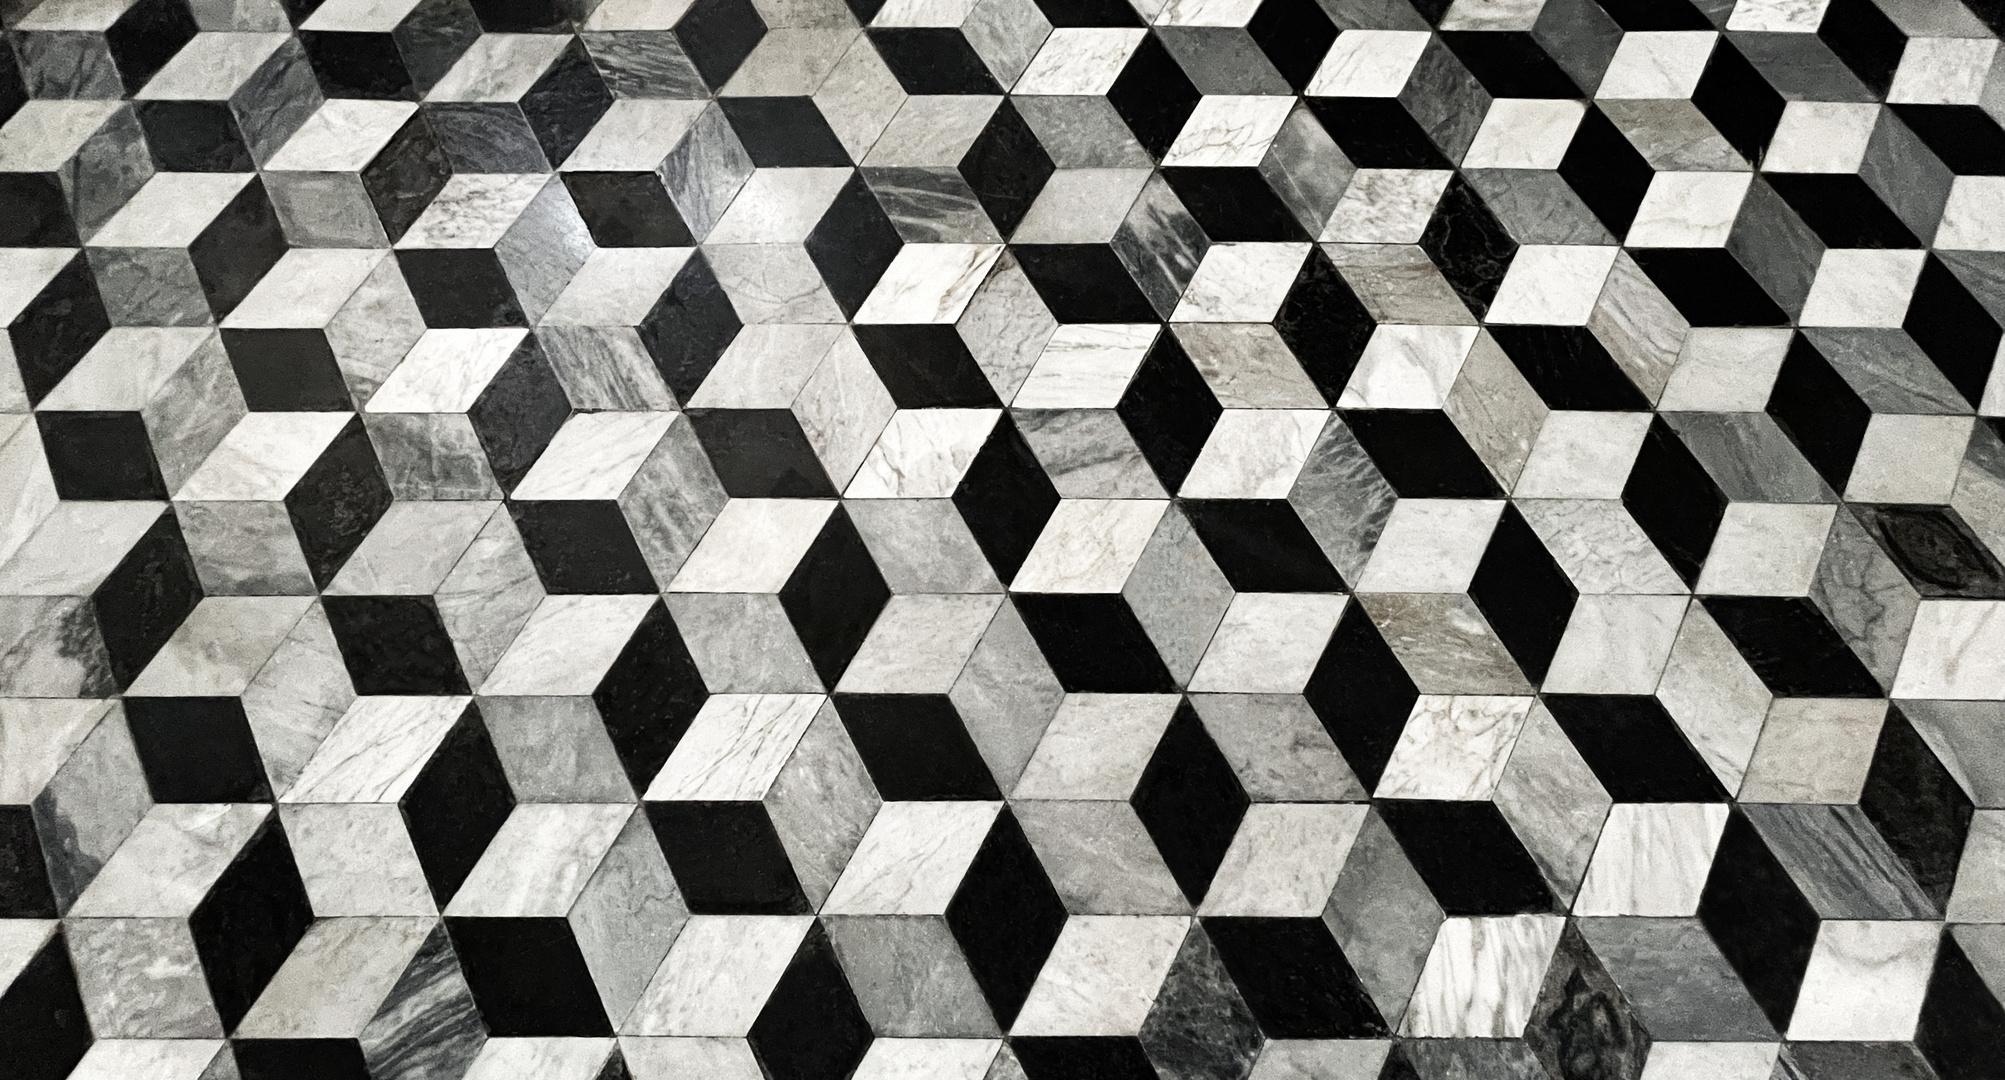 Verwirrende Symmetrie